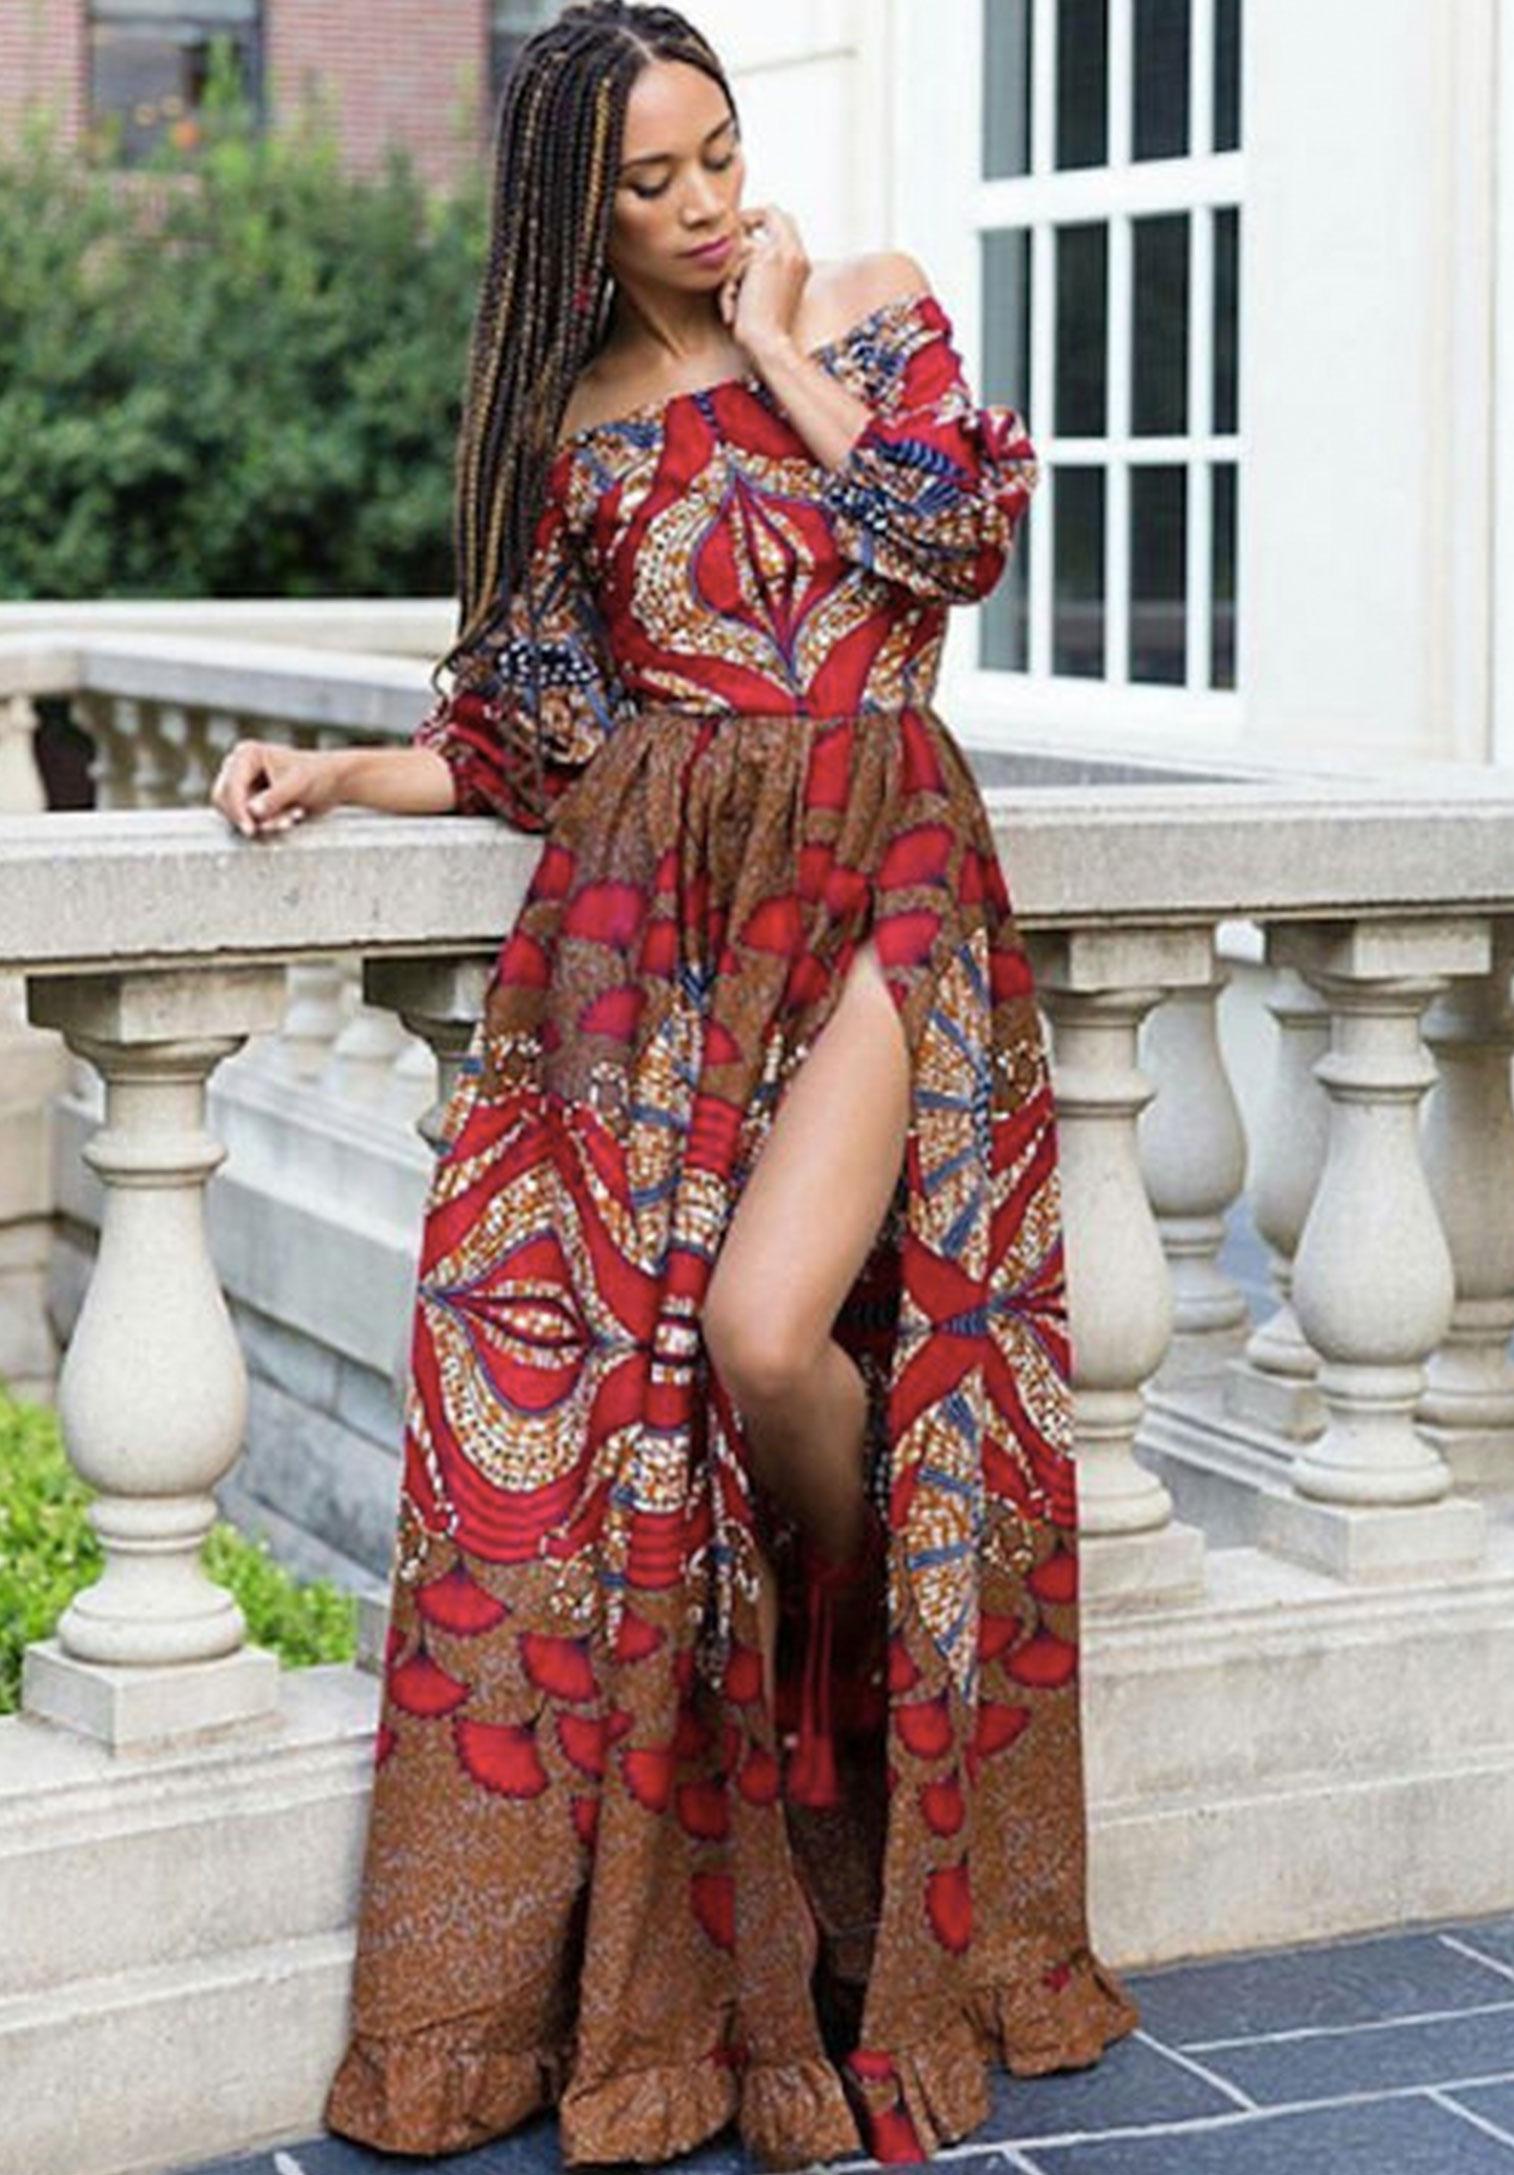 Stylish African Attire Womens Dress - Kipfashion